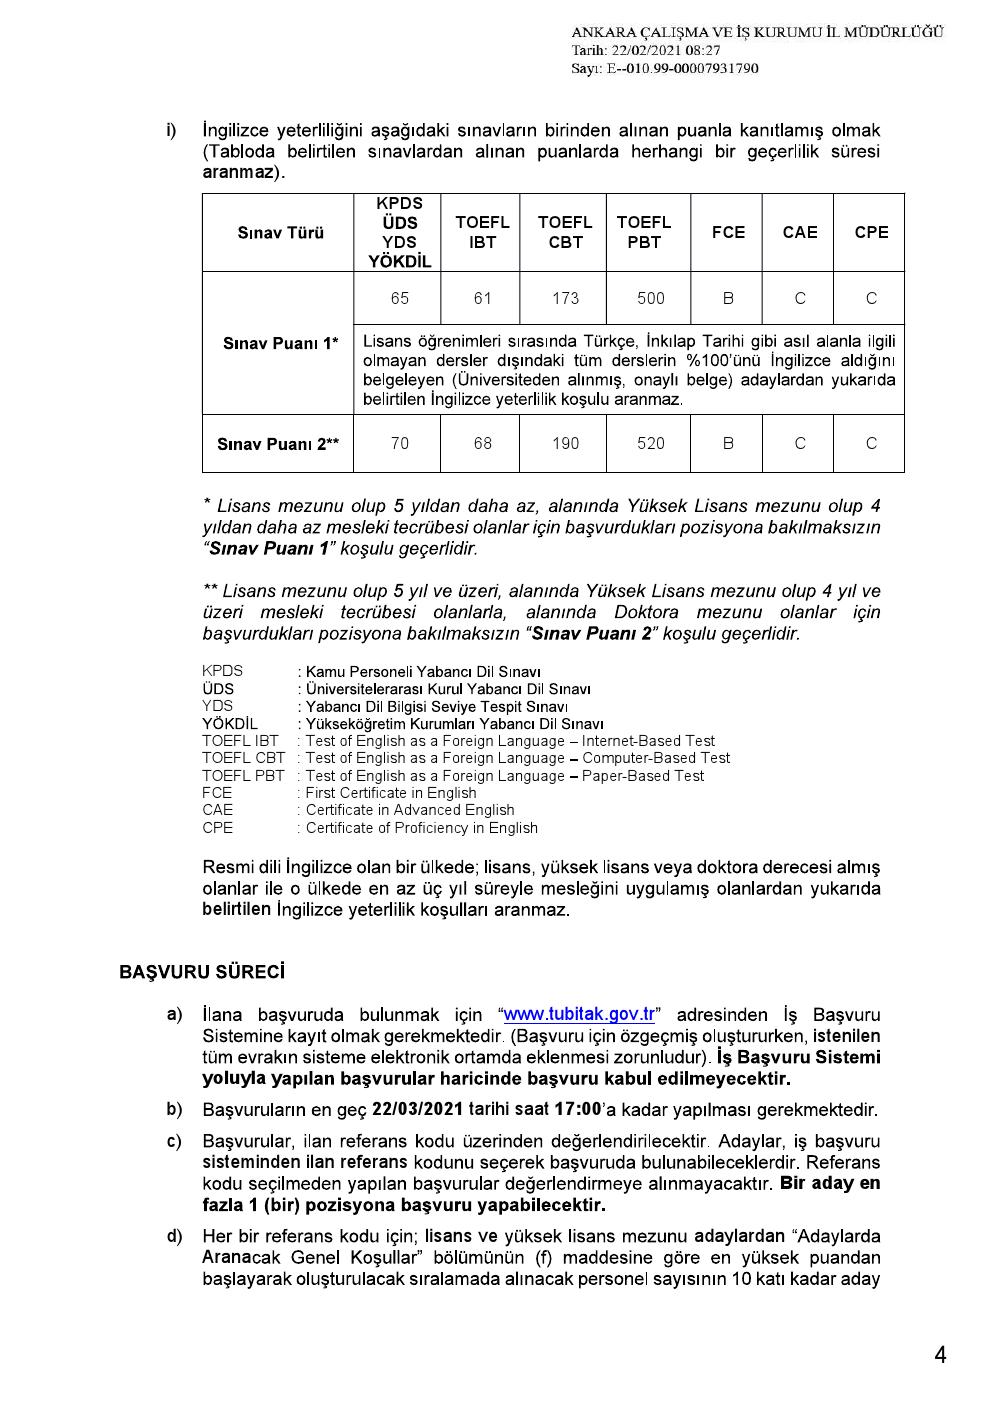 ankara-tubitak-bilgi-isl-daire-bask-pers-alimi-22-03-2021-000005.png